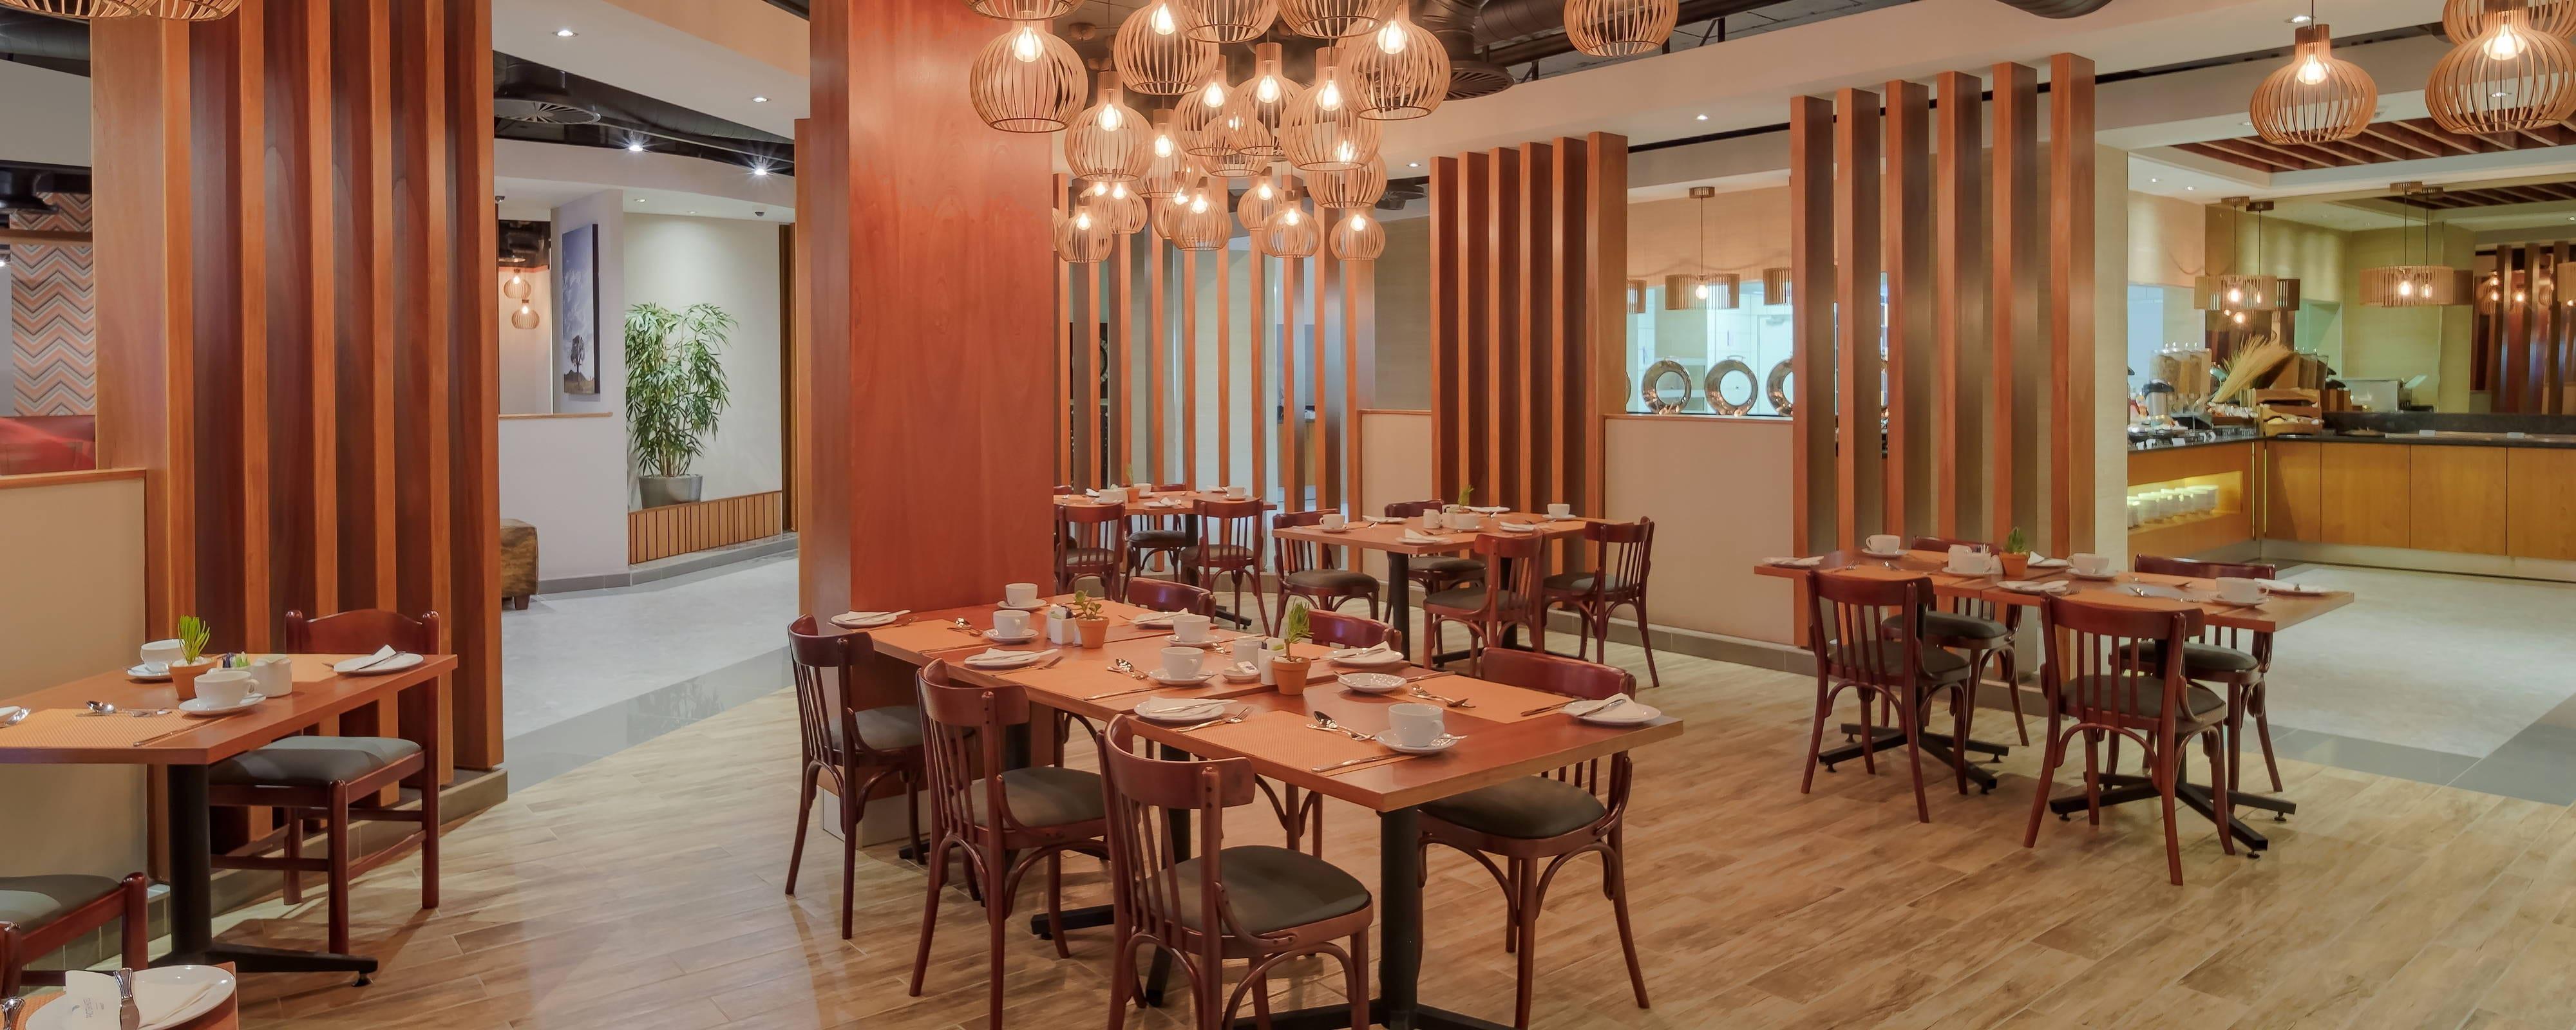 Restaurants In Pretoria